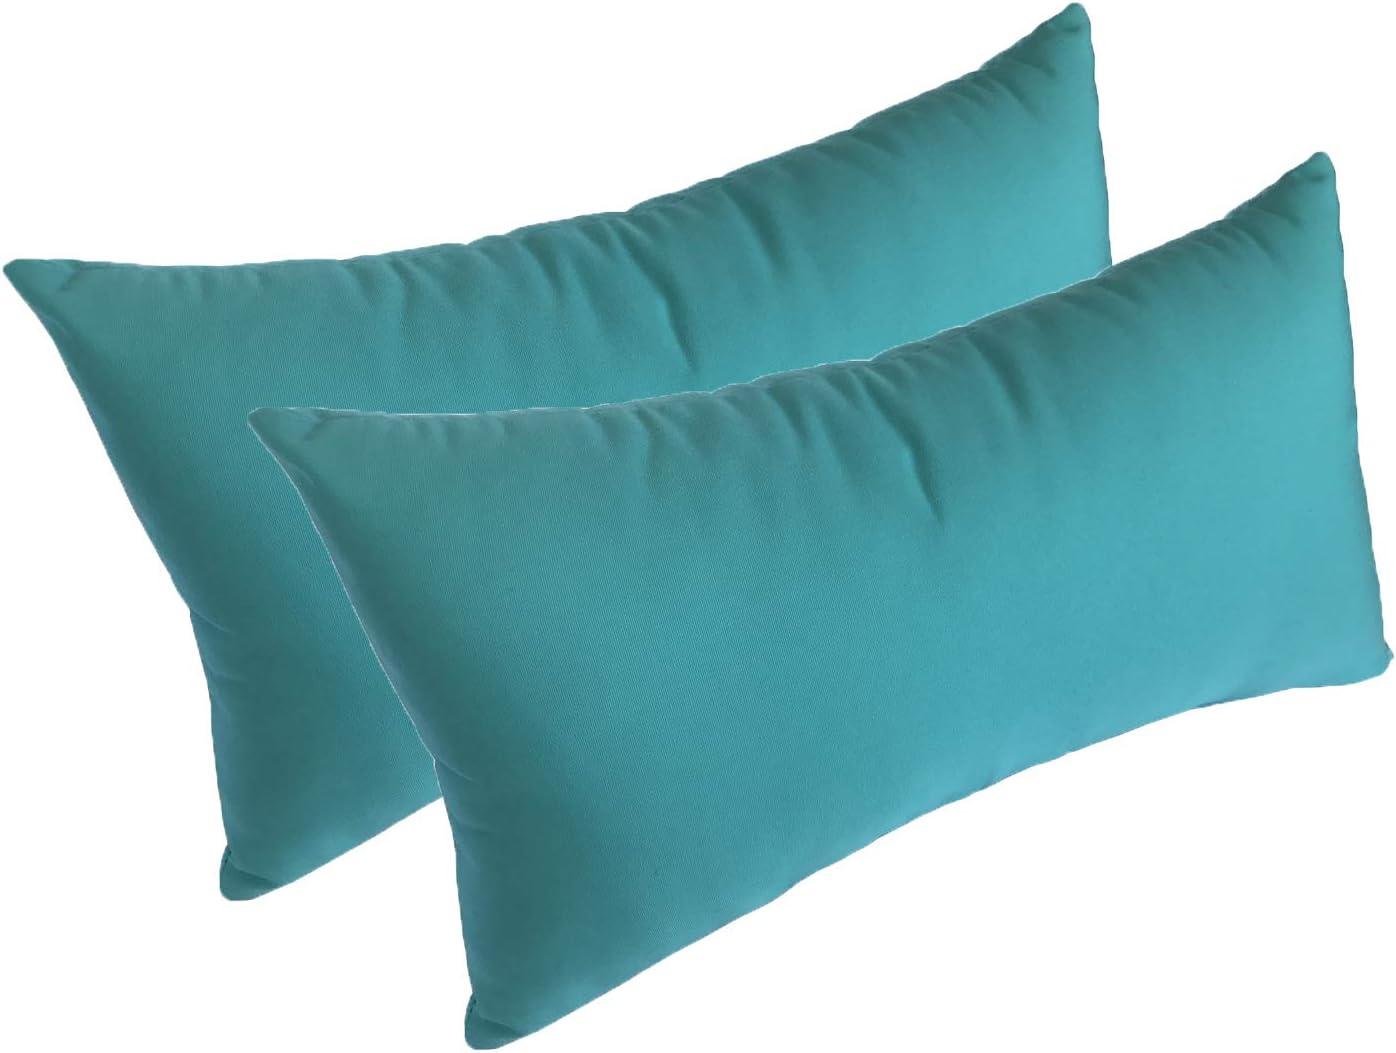 Amazon Com Set Of 2 22x12x4 Sunbrella Indoor Outdoor Fabrics Lumbar Pillows In Aruba By Comfort Classics Inc Garden Outdoor